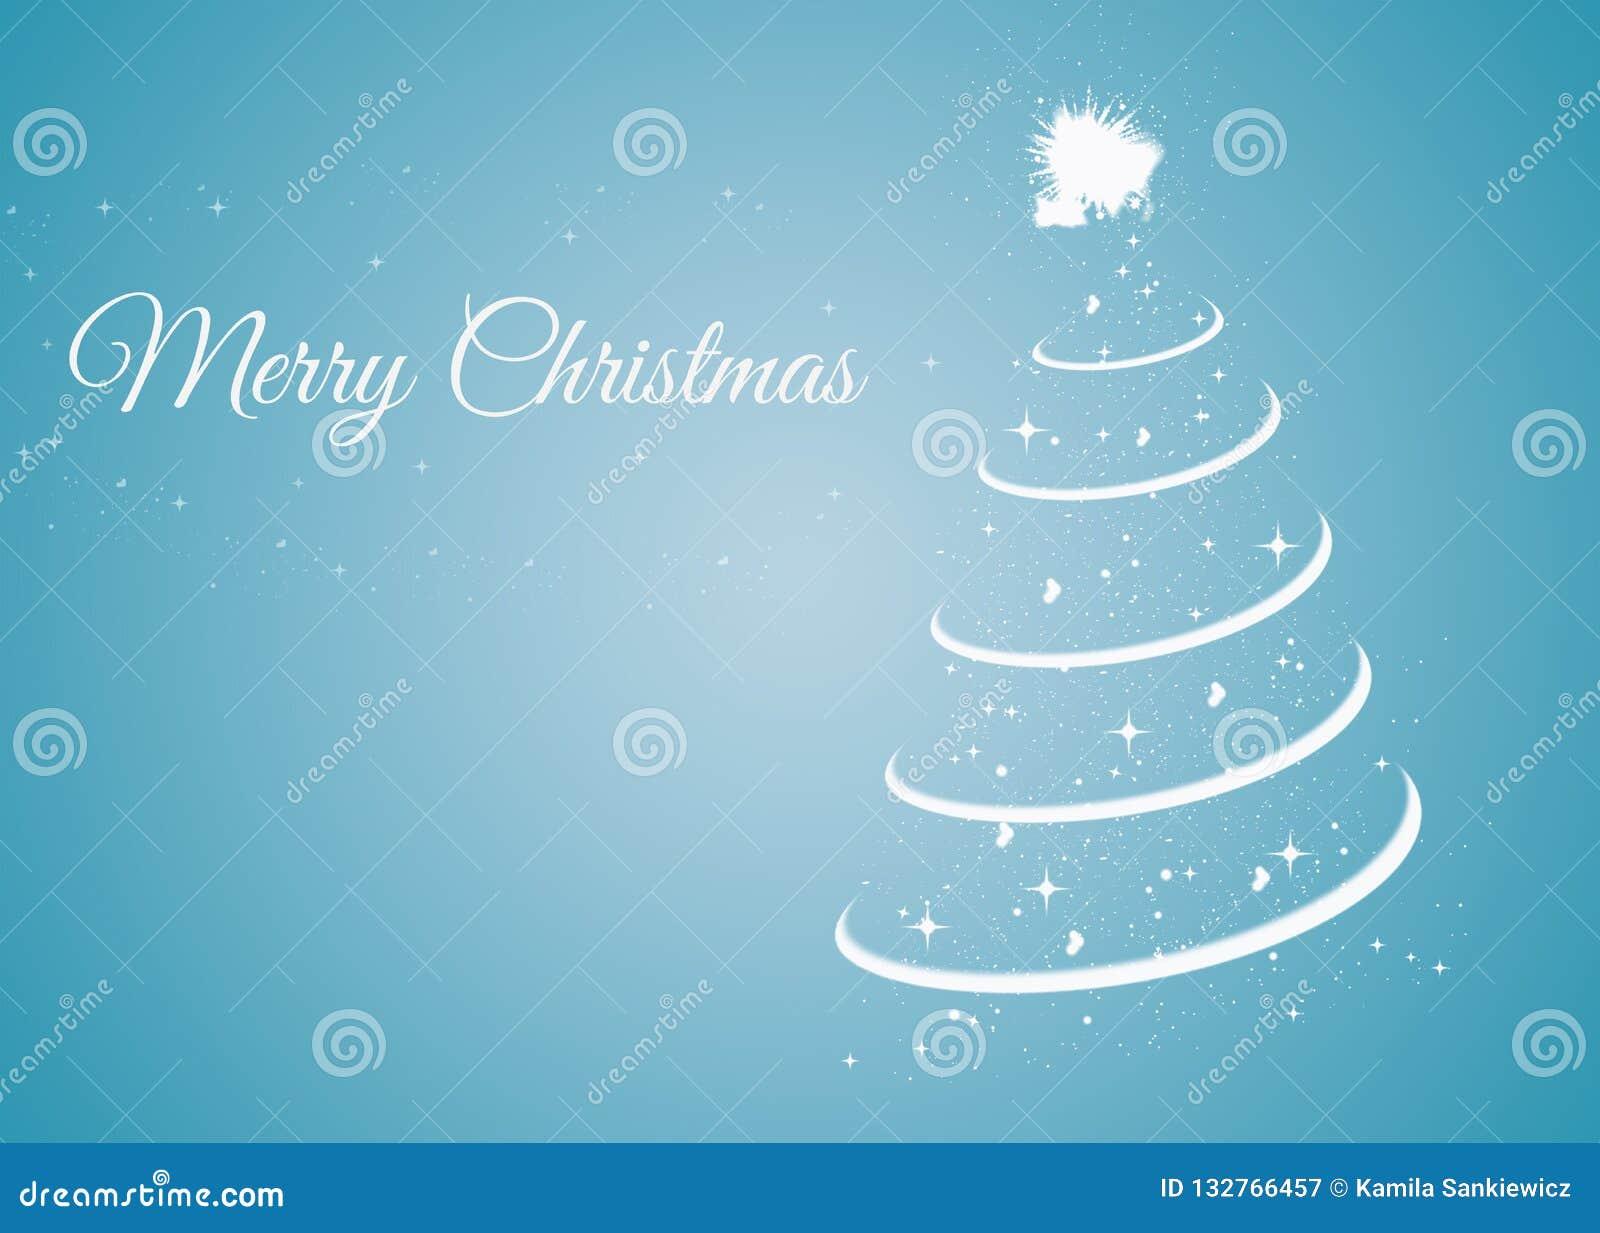 Kerstkaart met Kerstmisboom op blauwe achtergrond